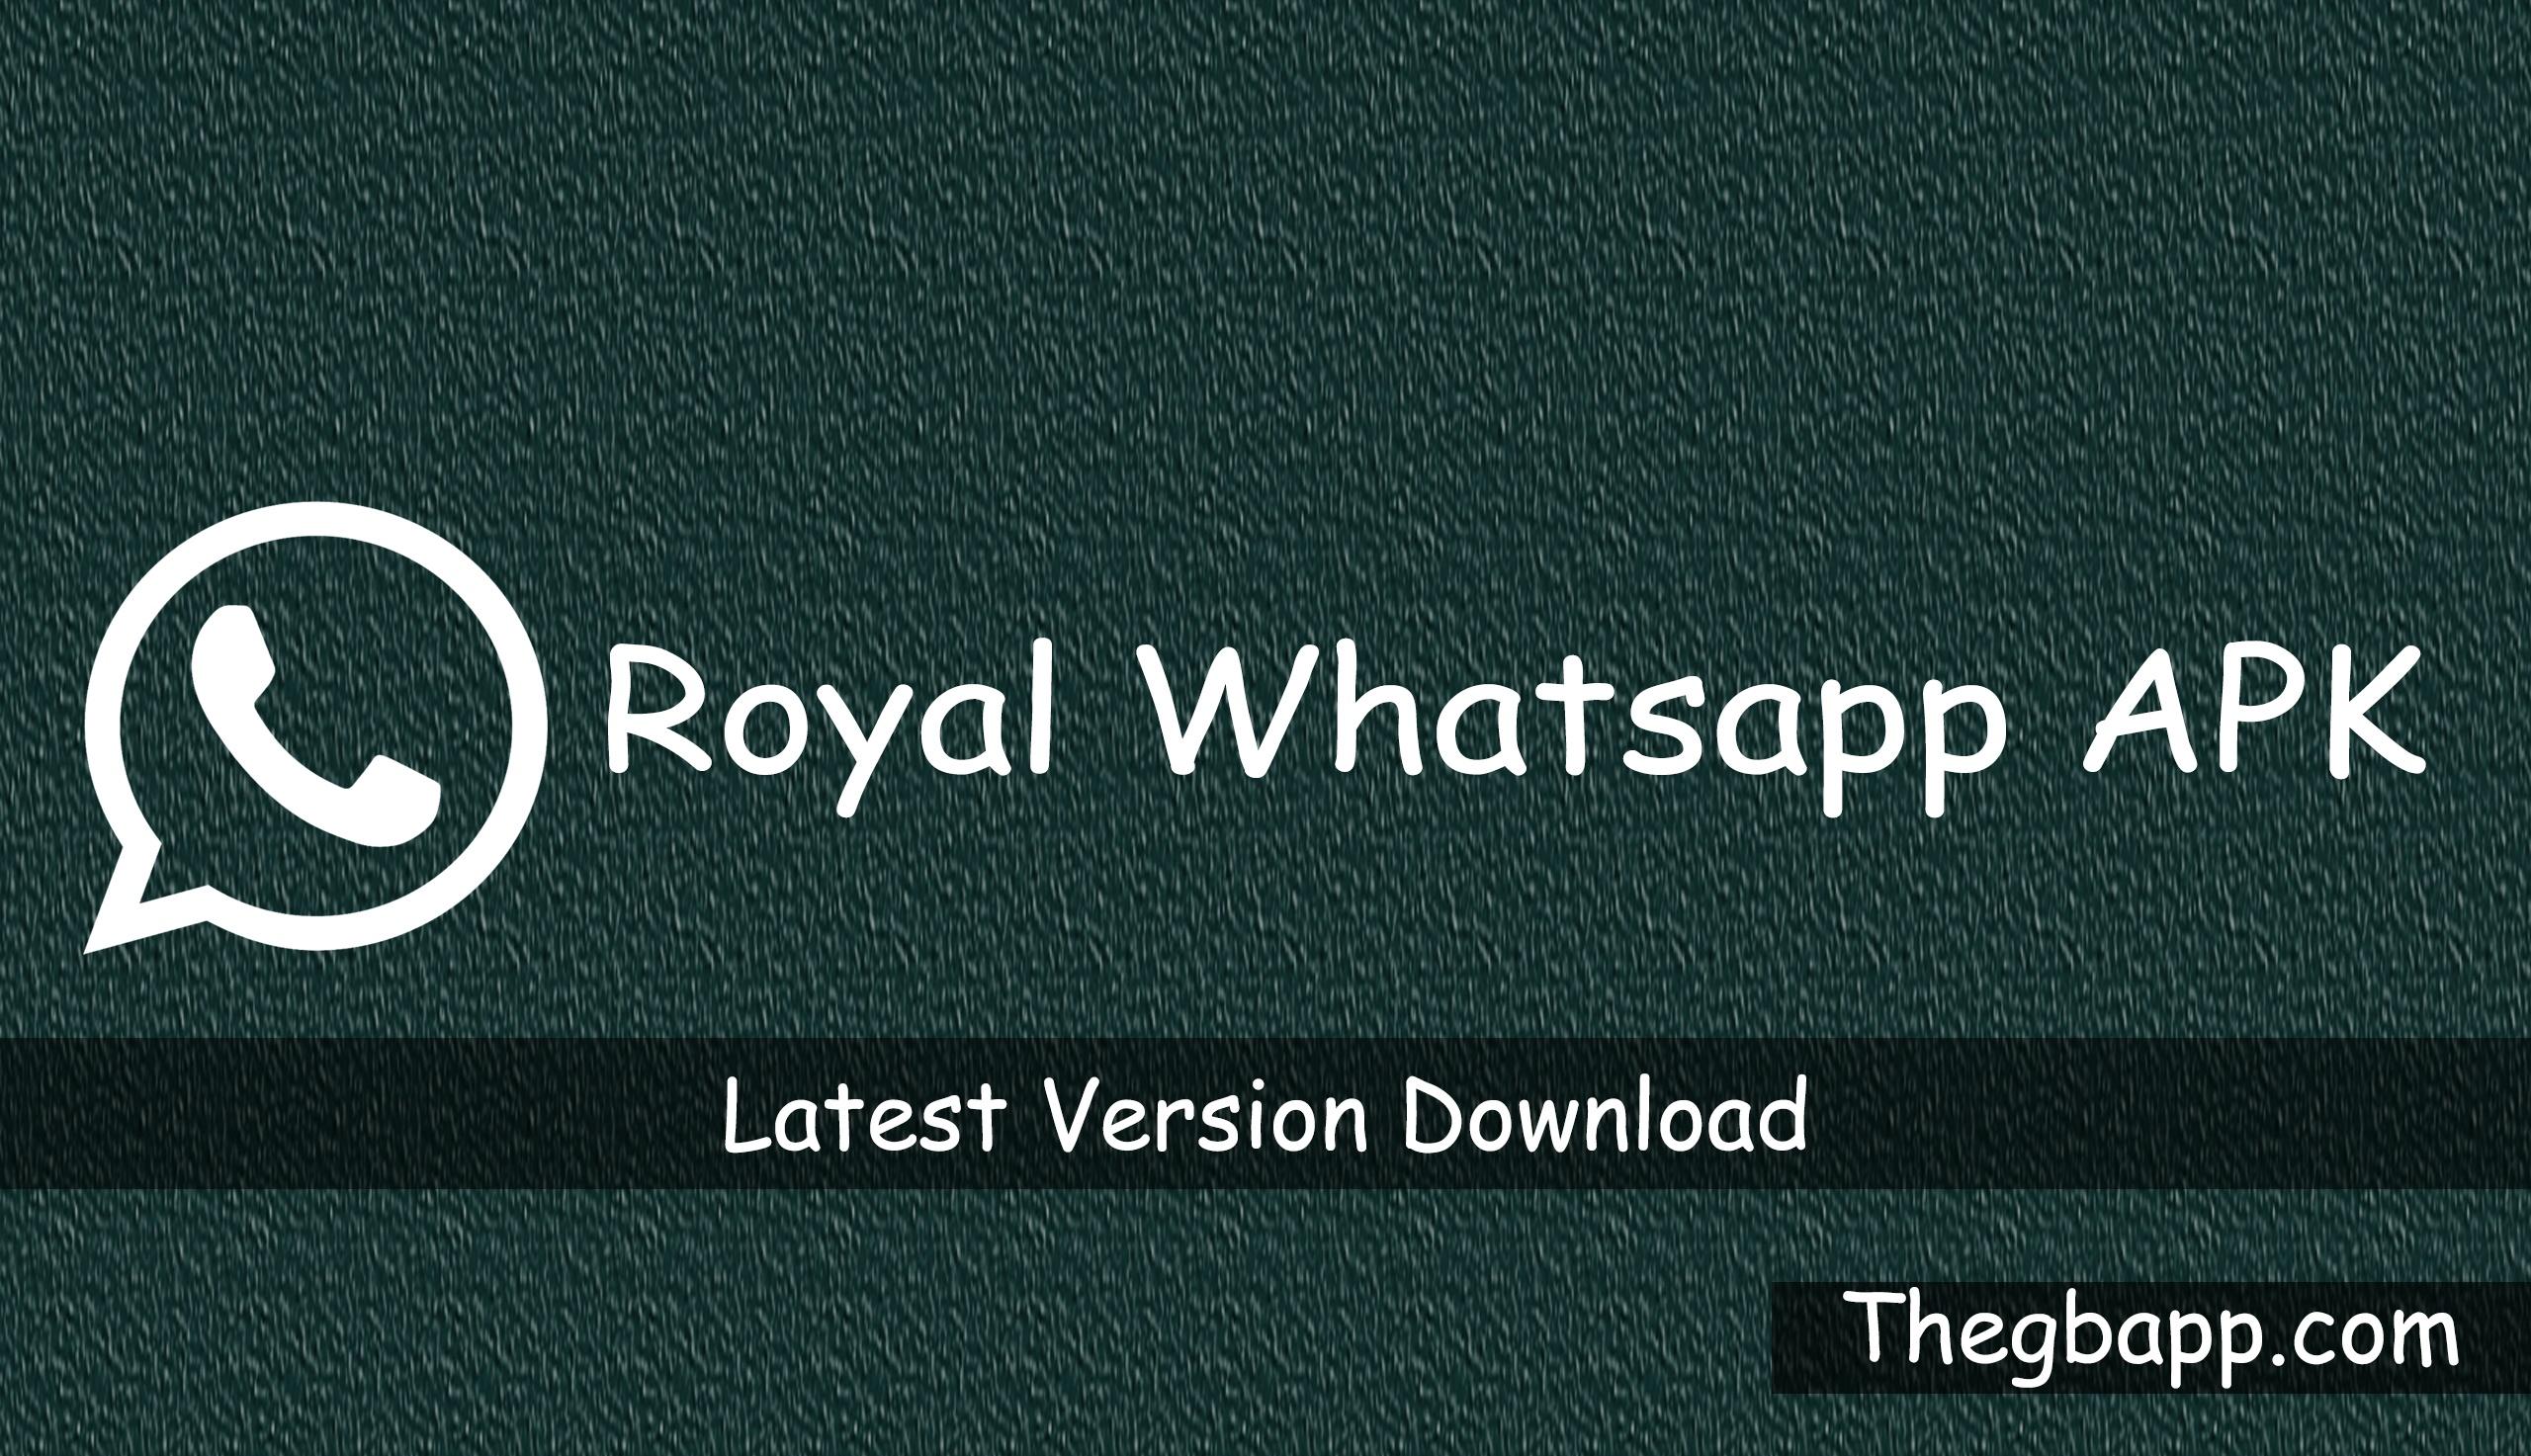 Royal Whatsapp APK